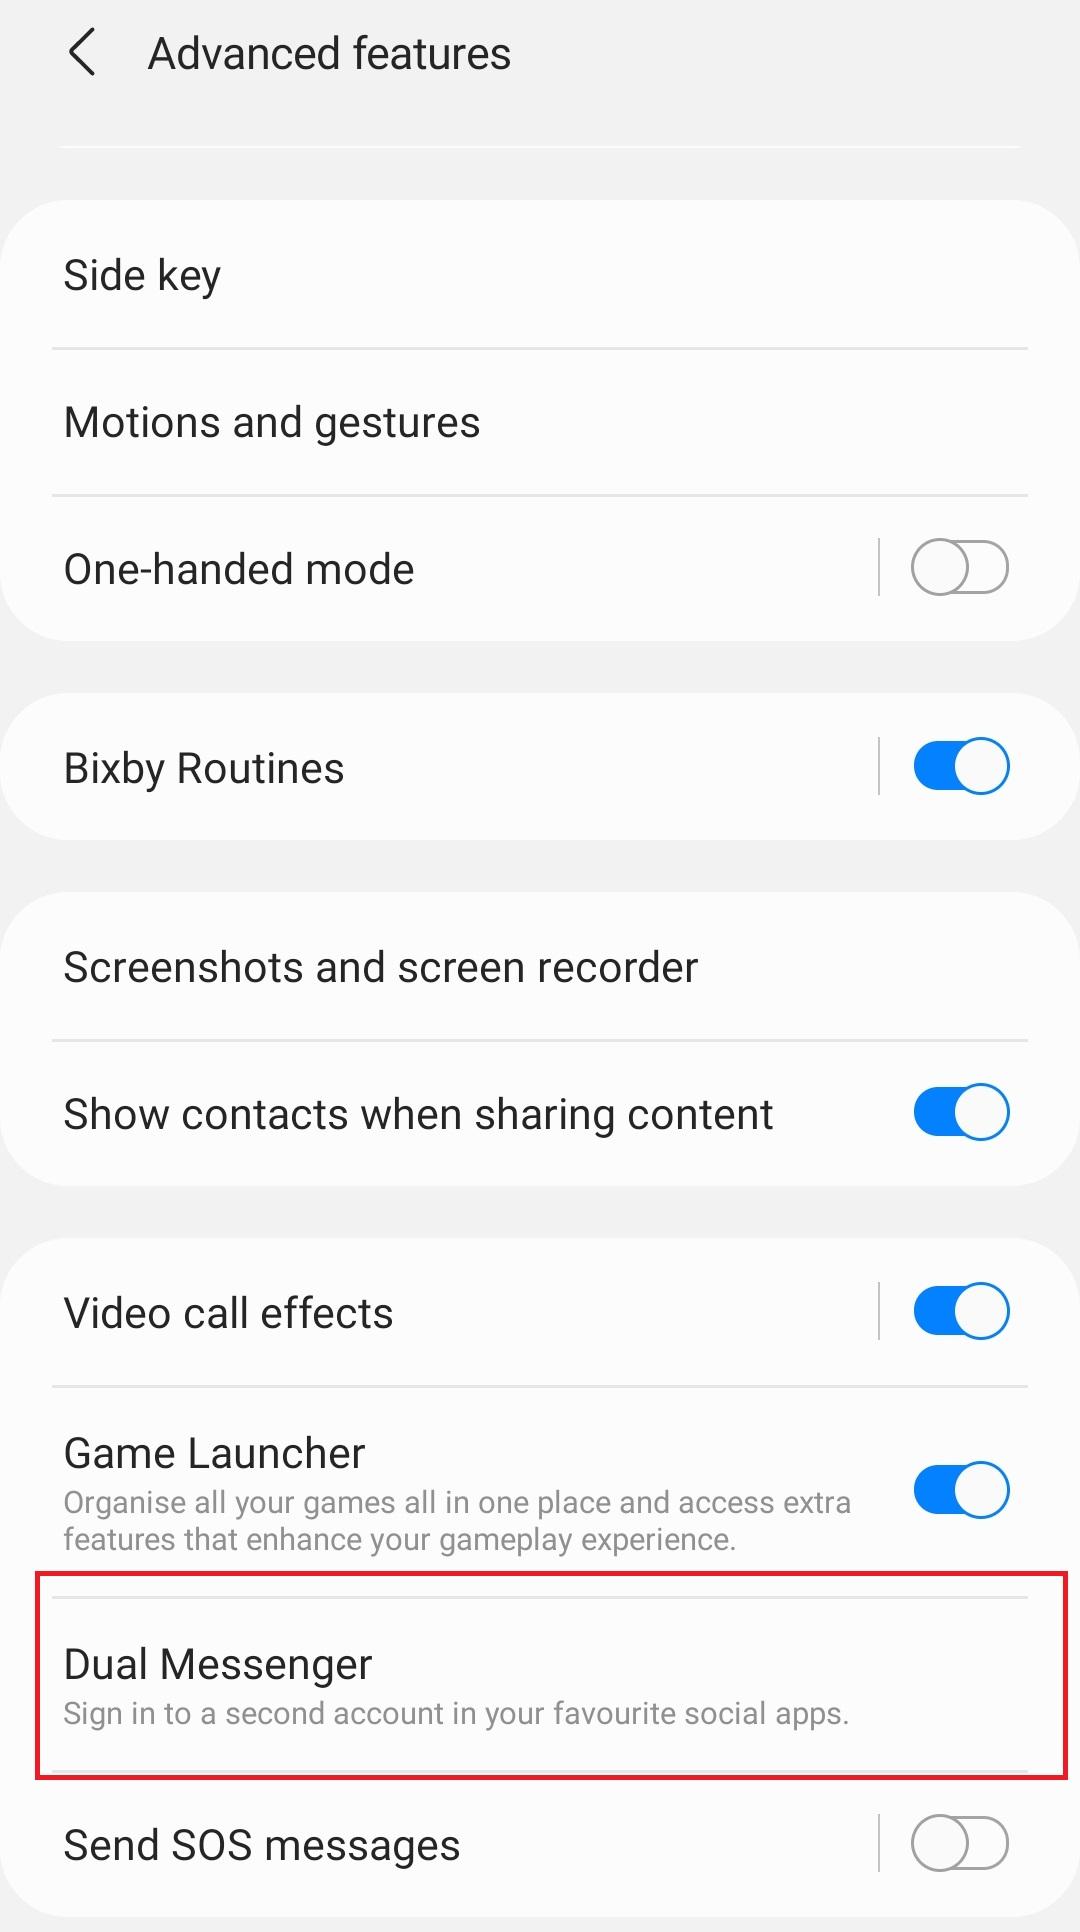 5 active whatsapp accounts